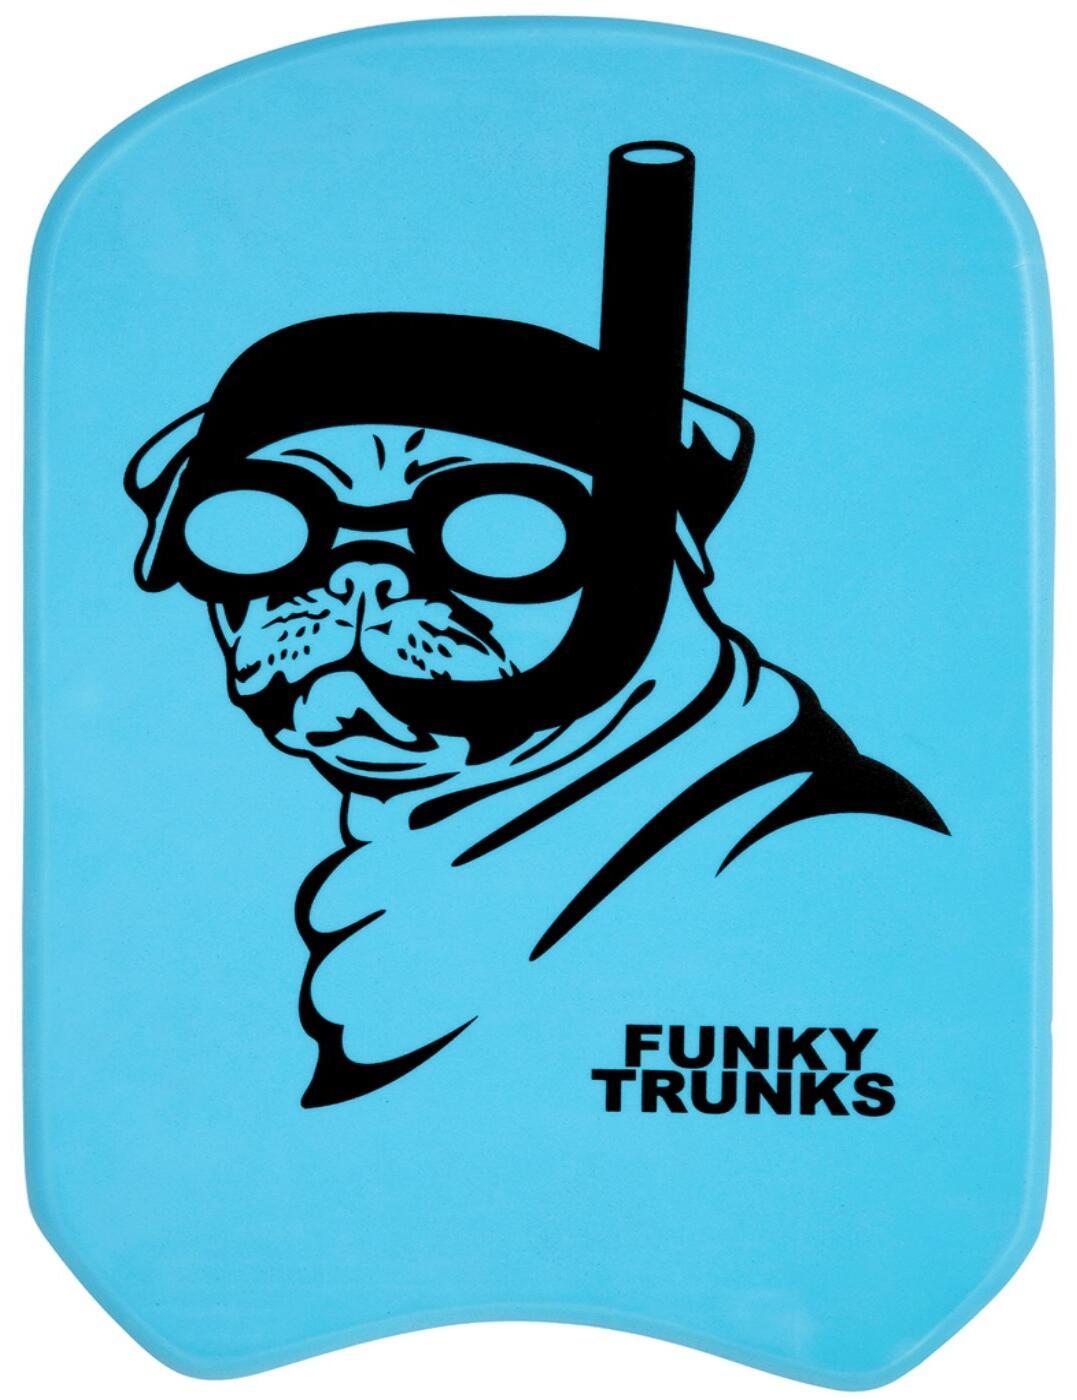 FTG00 Funky Trunks Snorkel Kickboard  - FTG002N00455 Snorkel Pug